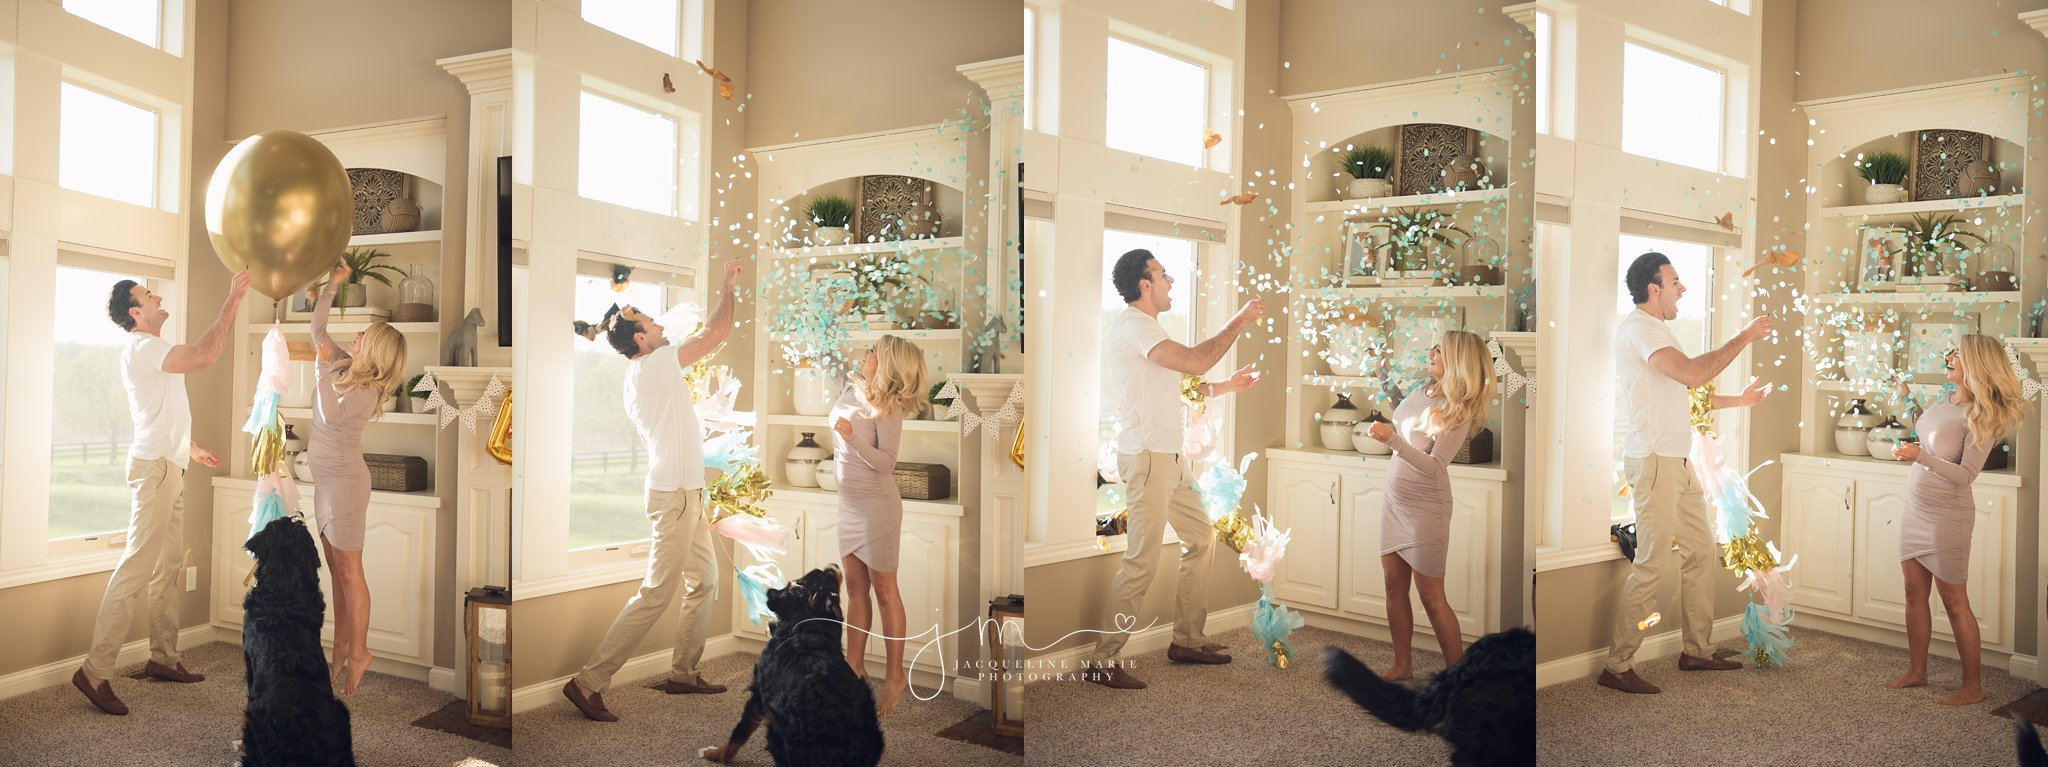 gender reveal balloon | gender reveal photography columbus ohio